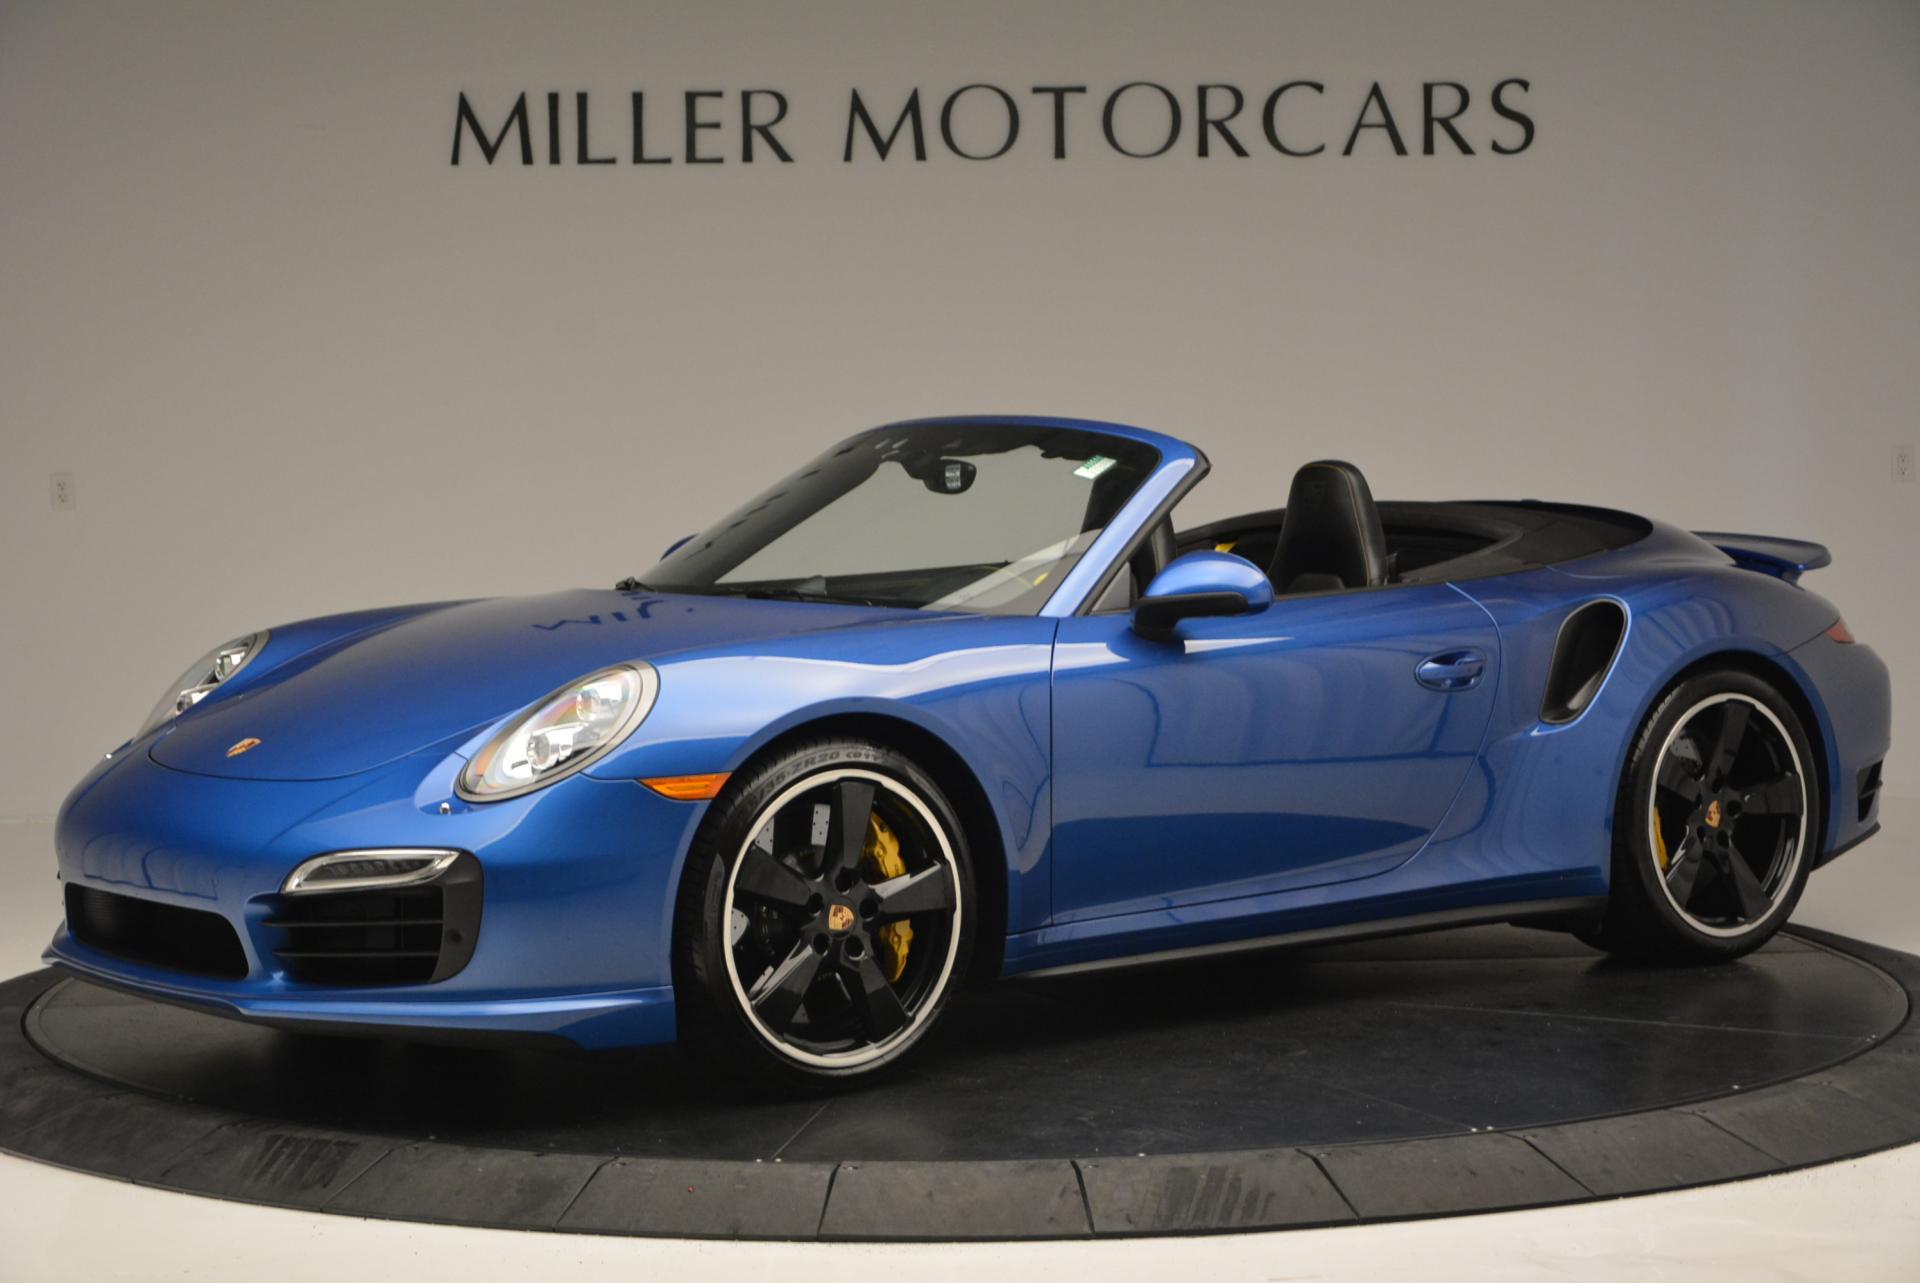 Used 2014 Porsche 911 Turbo S For Sale In Greenwich, CT 105_p2